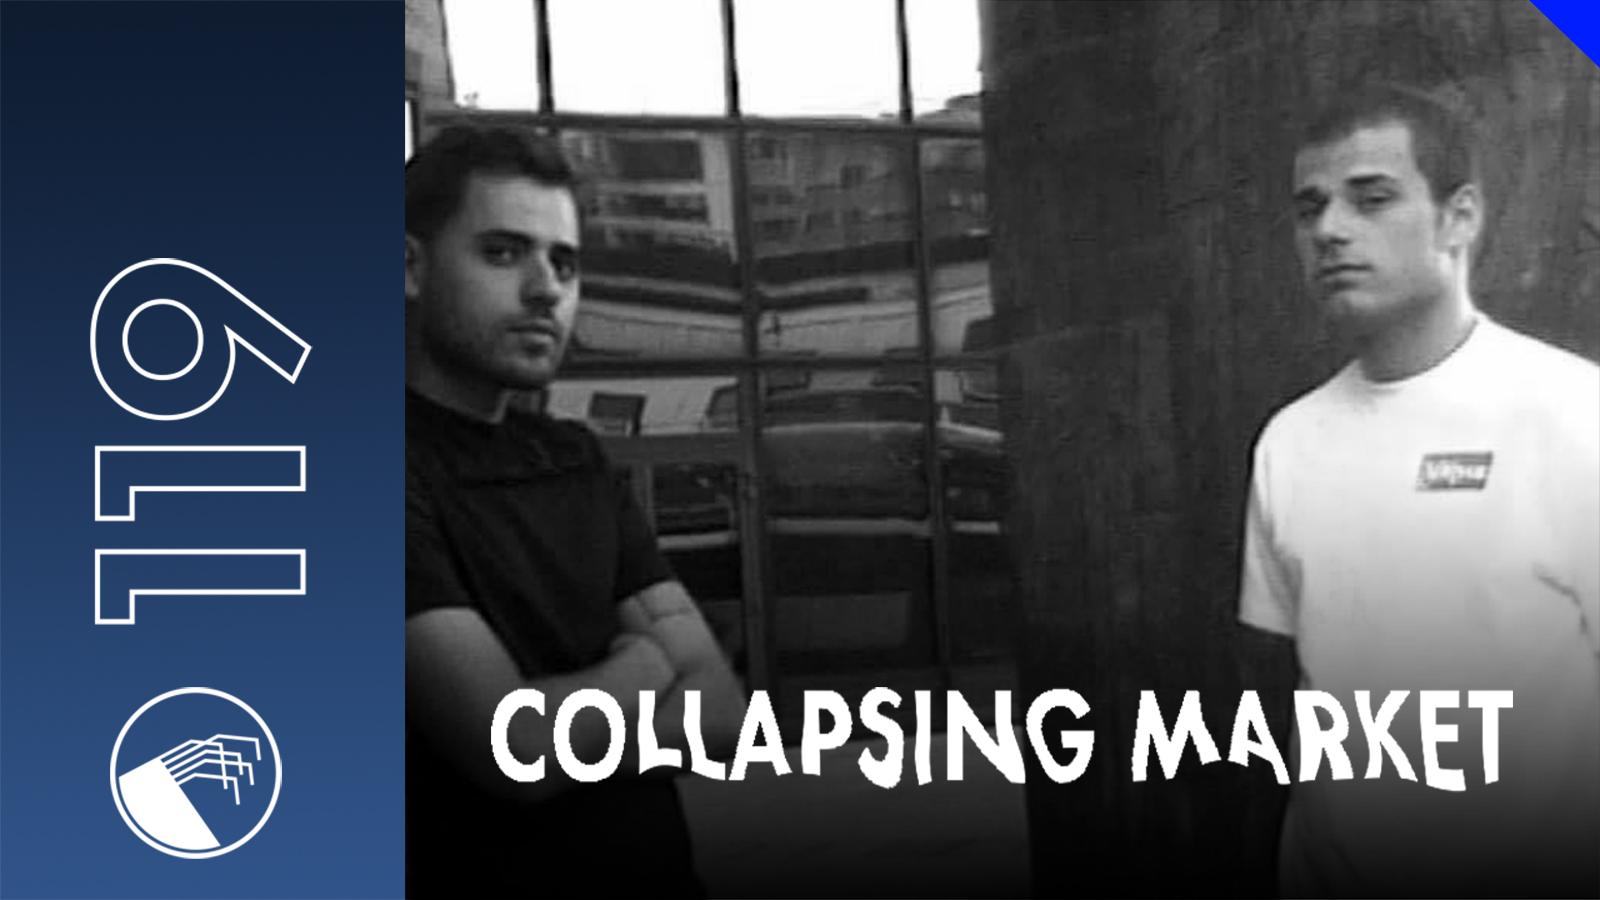 119 Collapsing Market